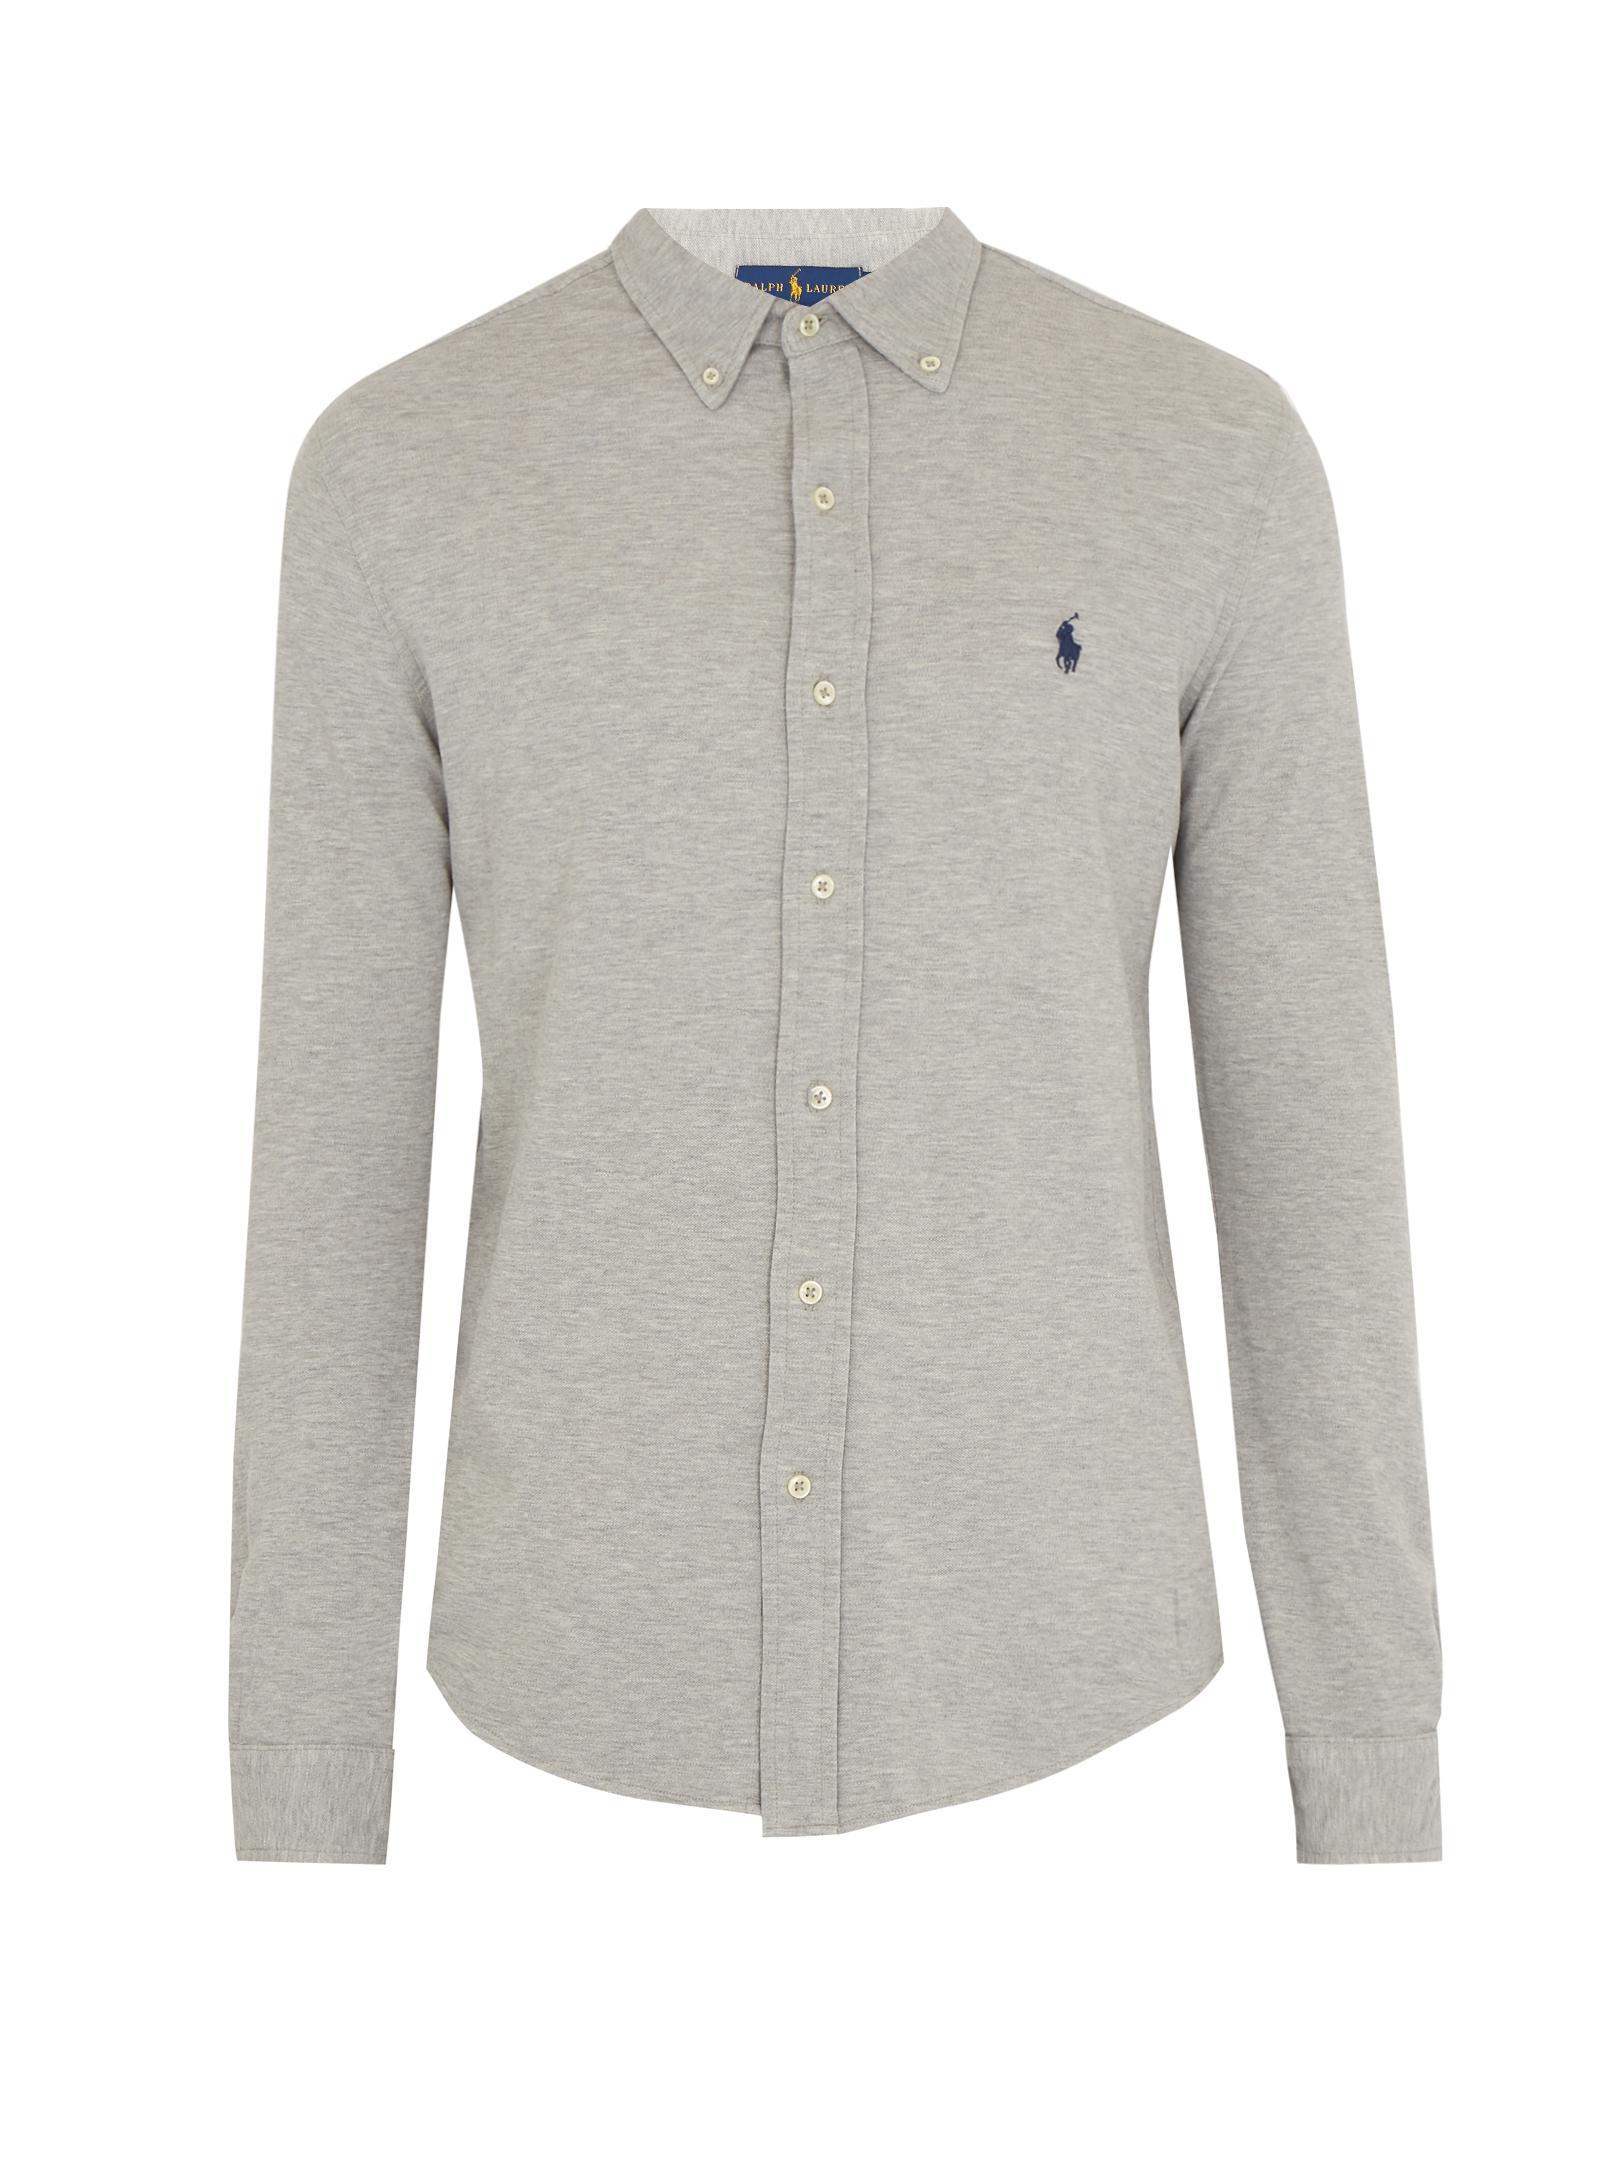 polo ralph lauren mesh knit cotton oxford shirt in gray